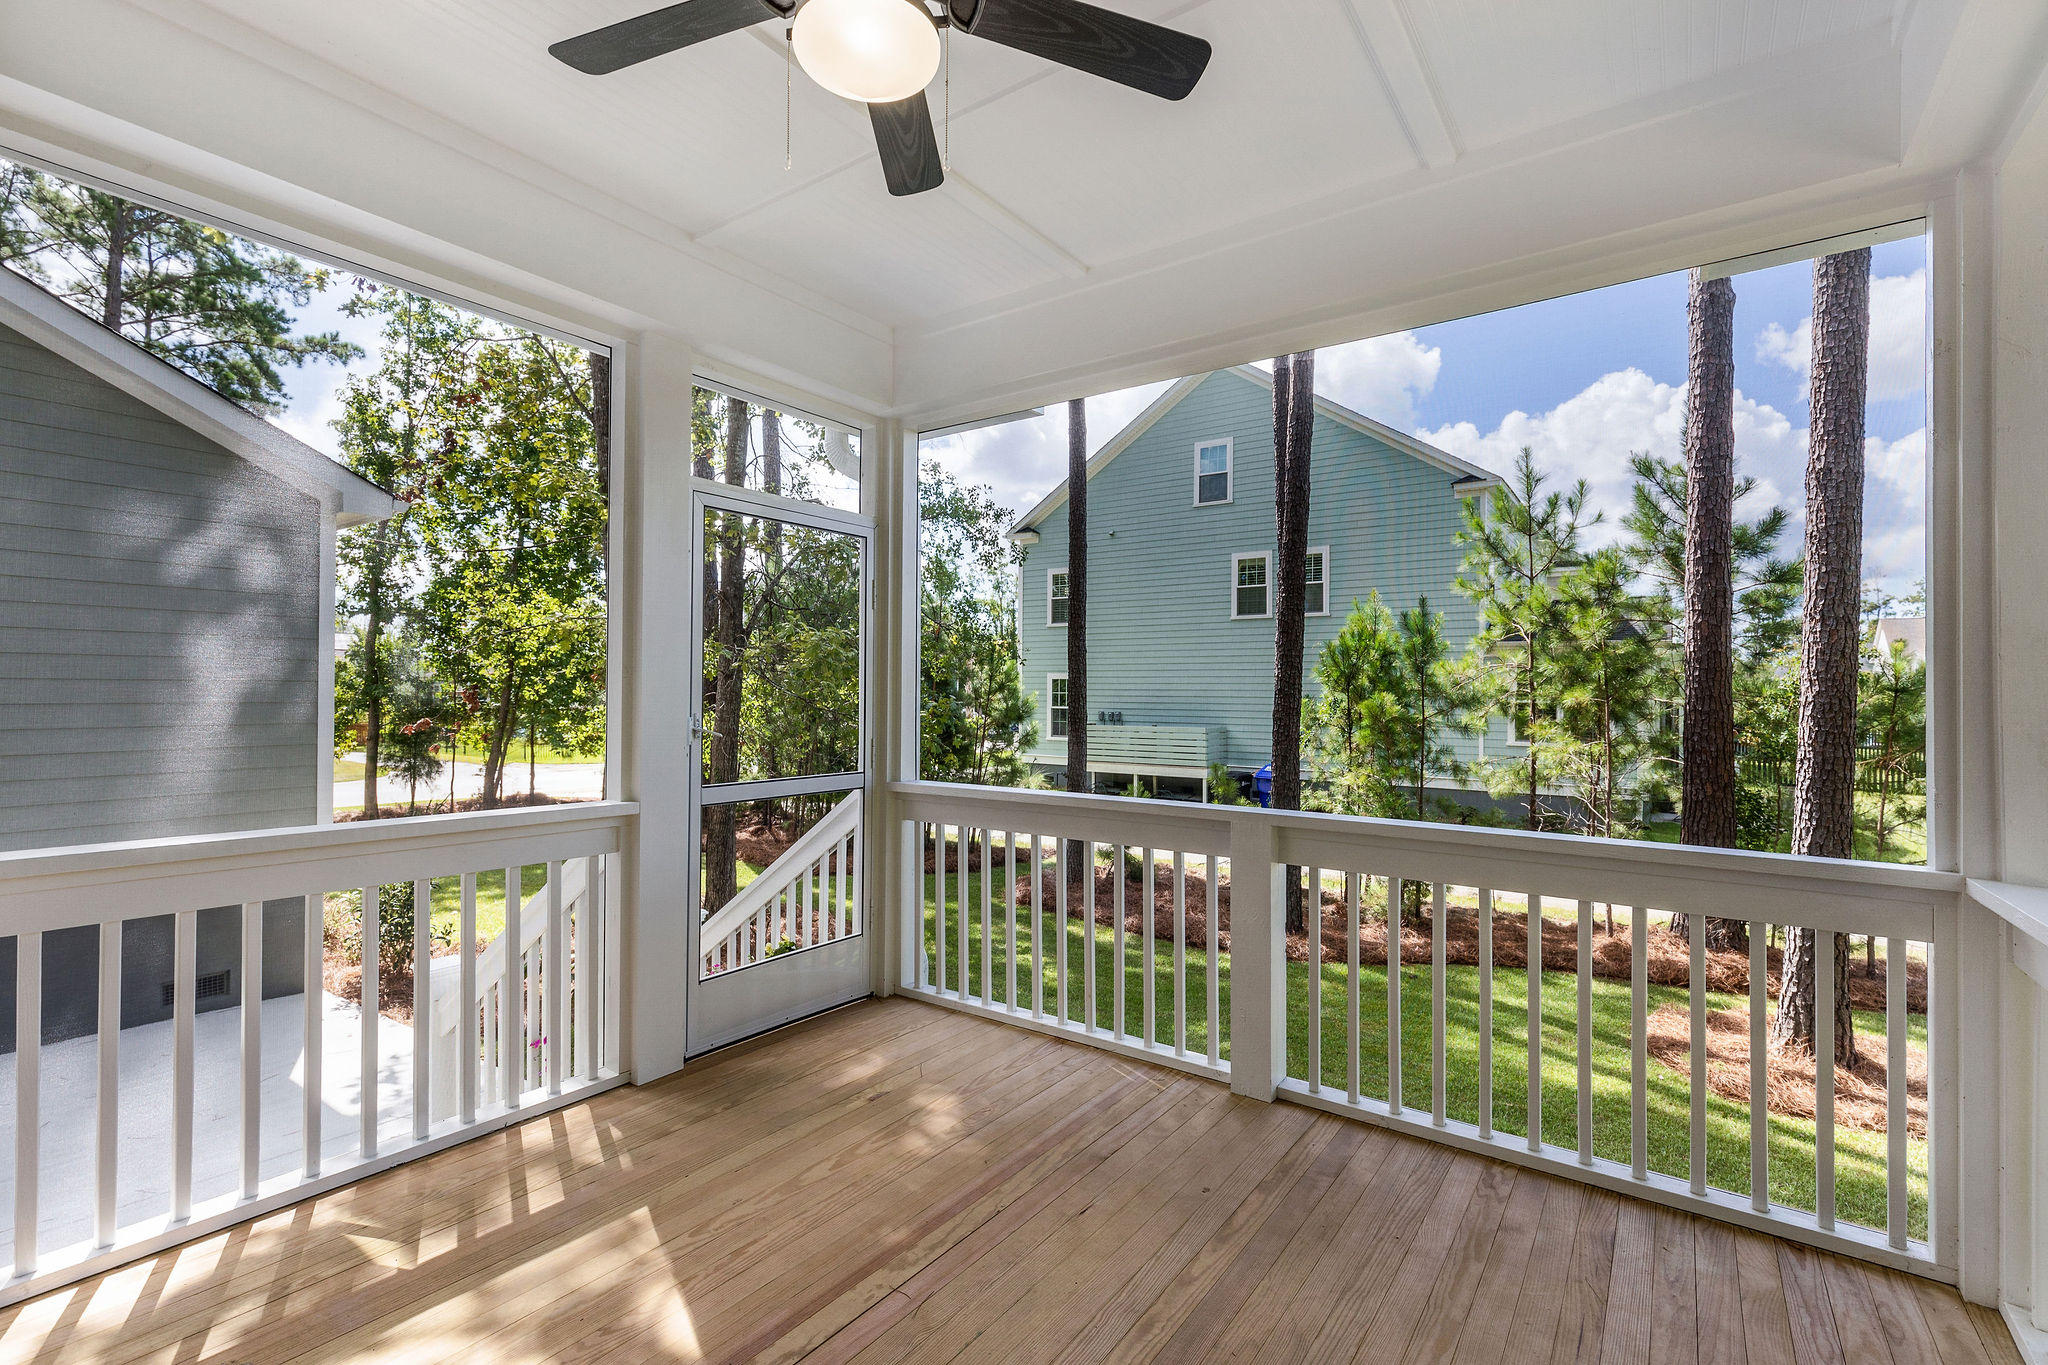 Park West Homes For Sale - 2291 Middlesex, Mount Pleasant, SC - 62